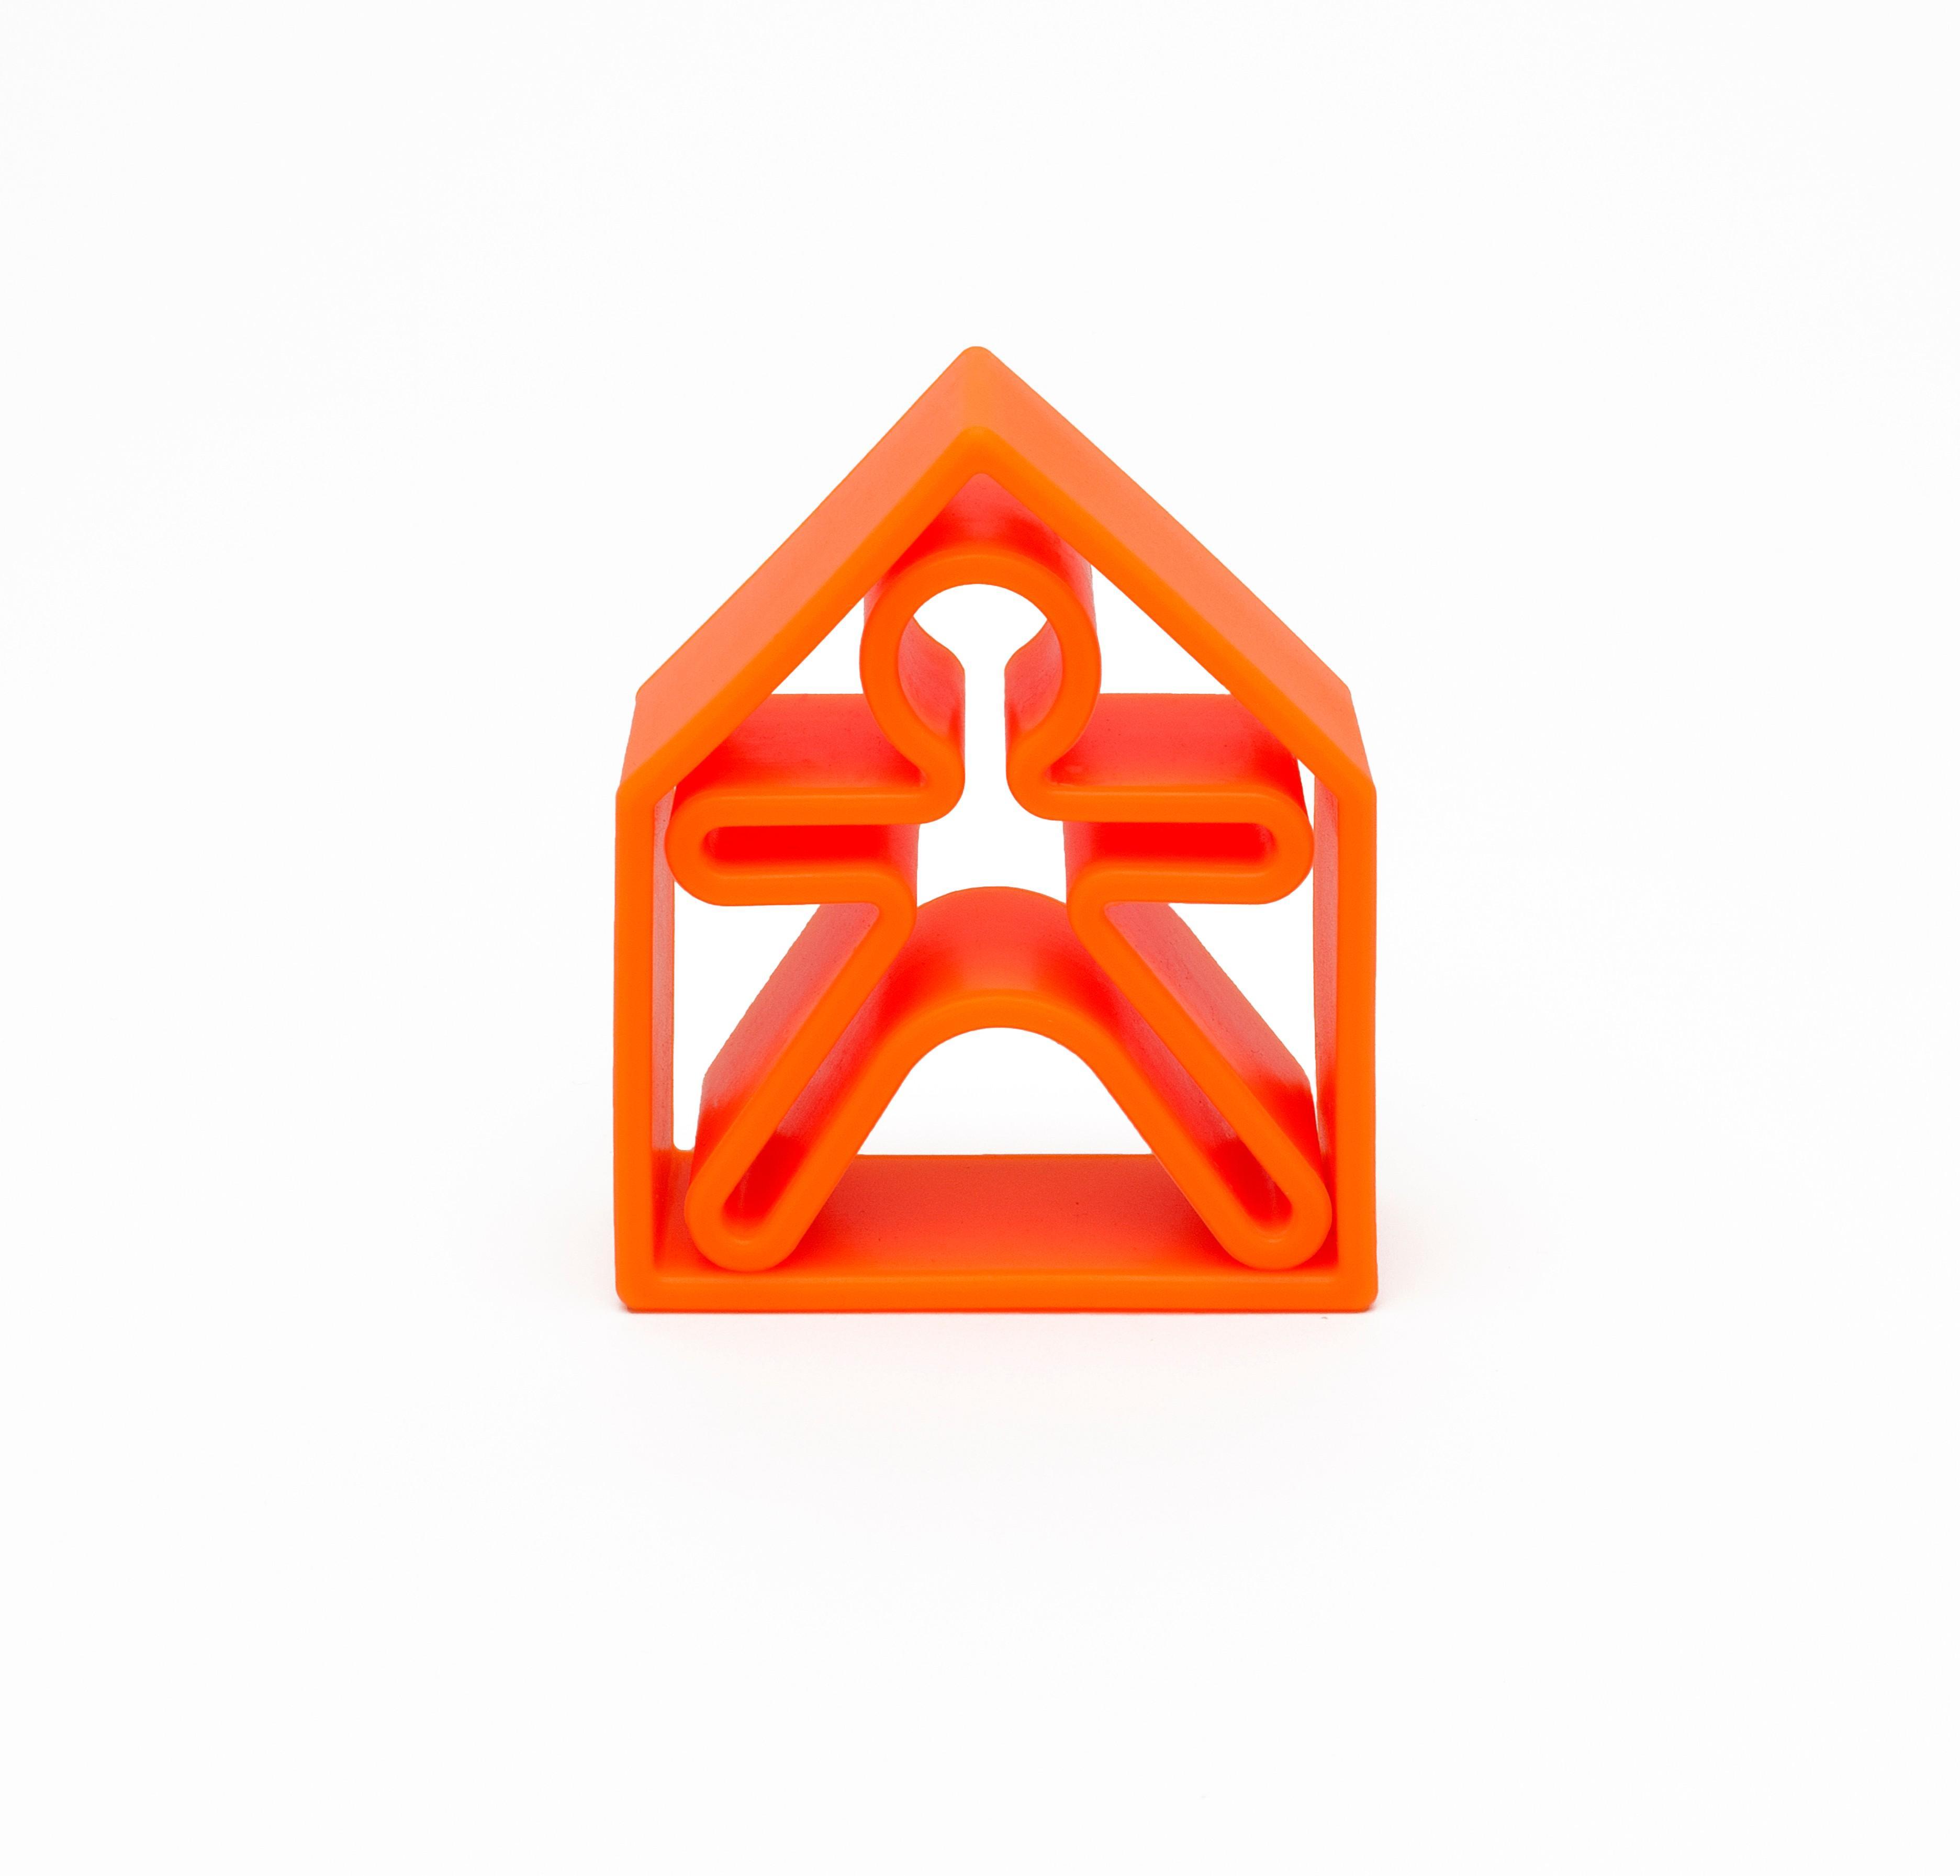 Dena - 1 Kid + 1 House Orange Neon